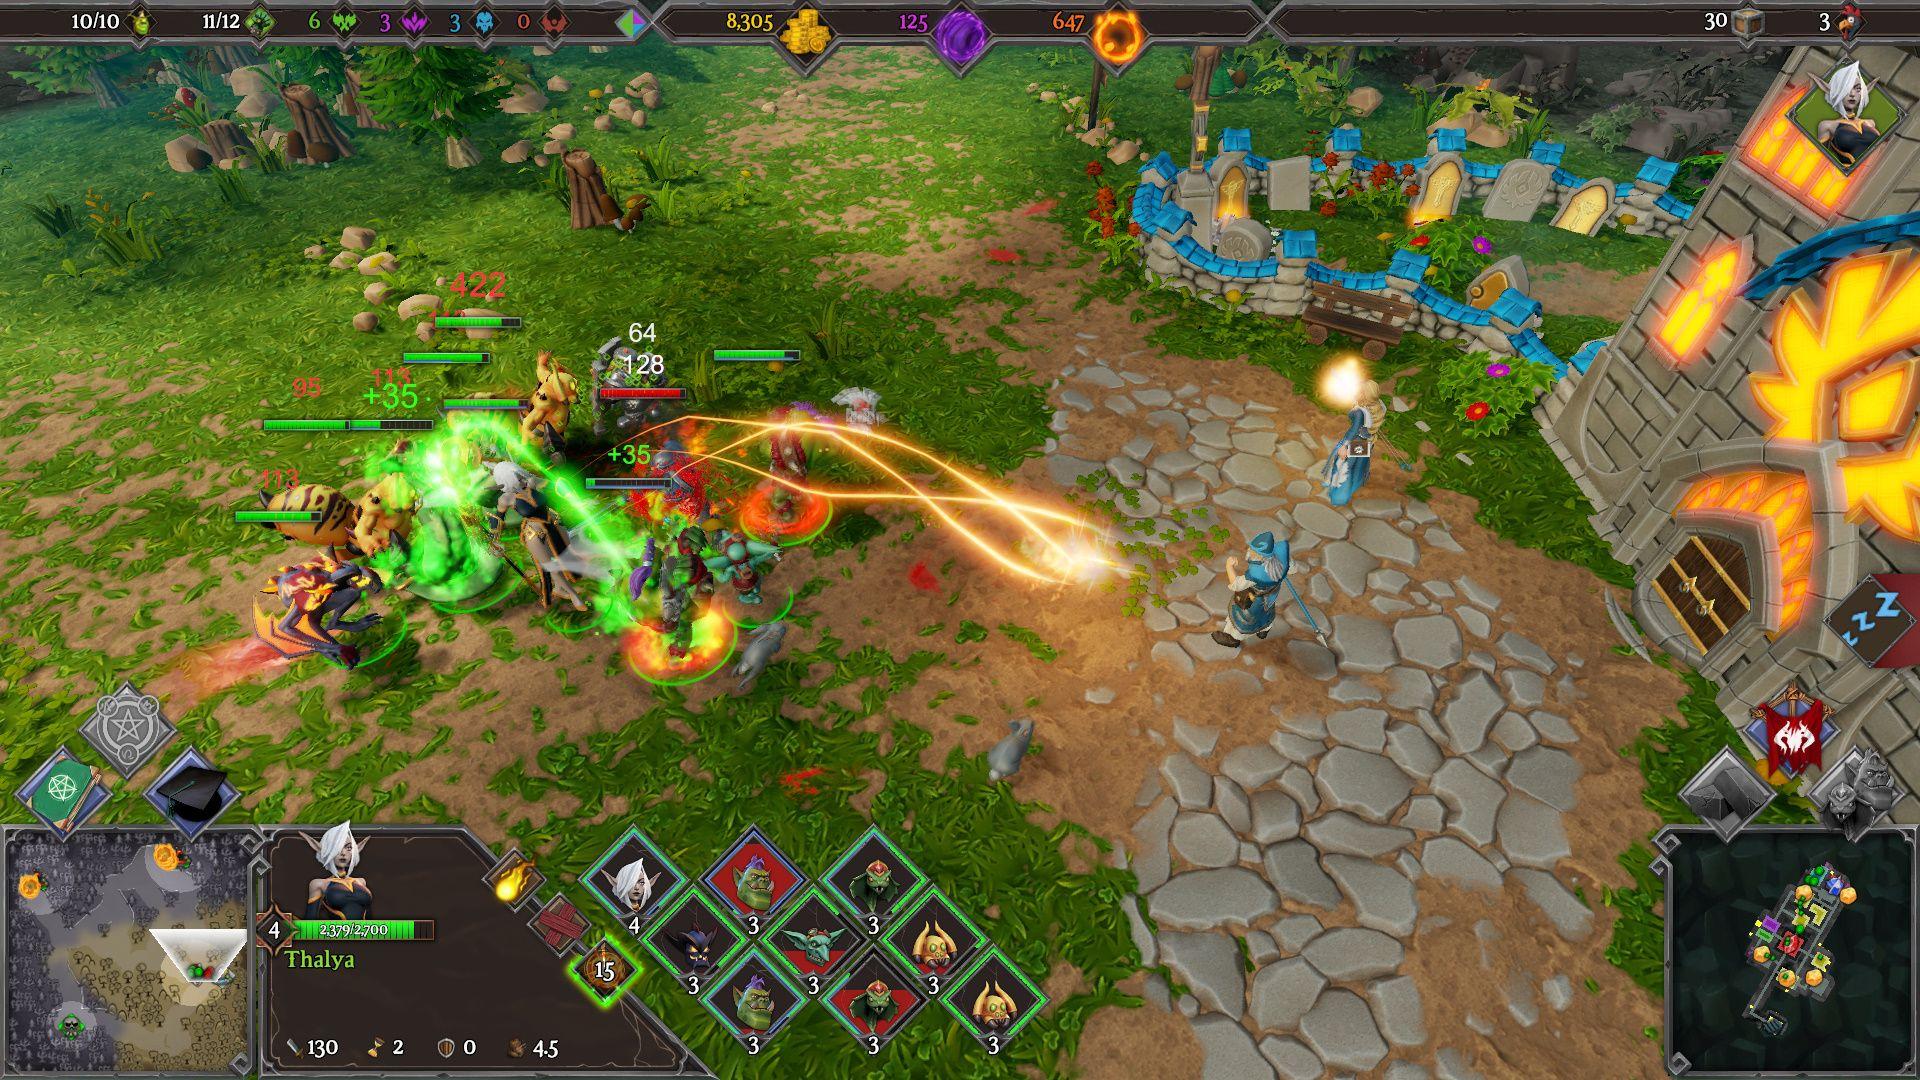 Dungeon 3 Screenshot 3